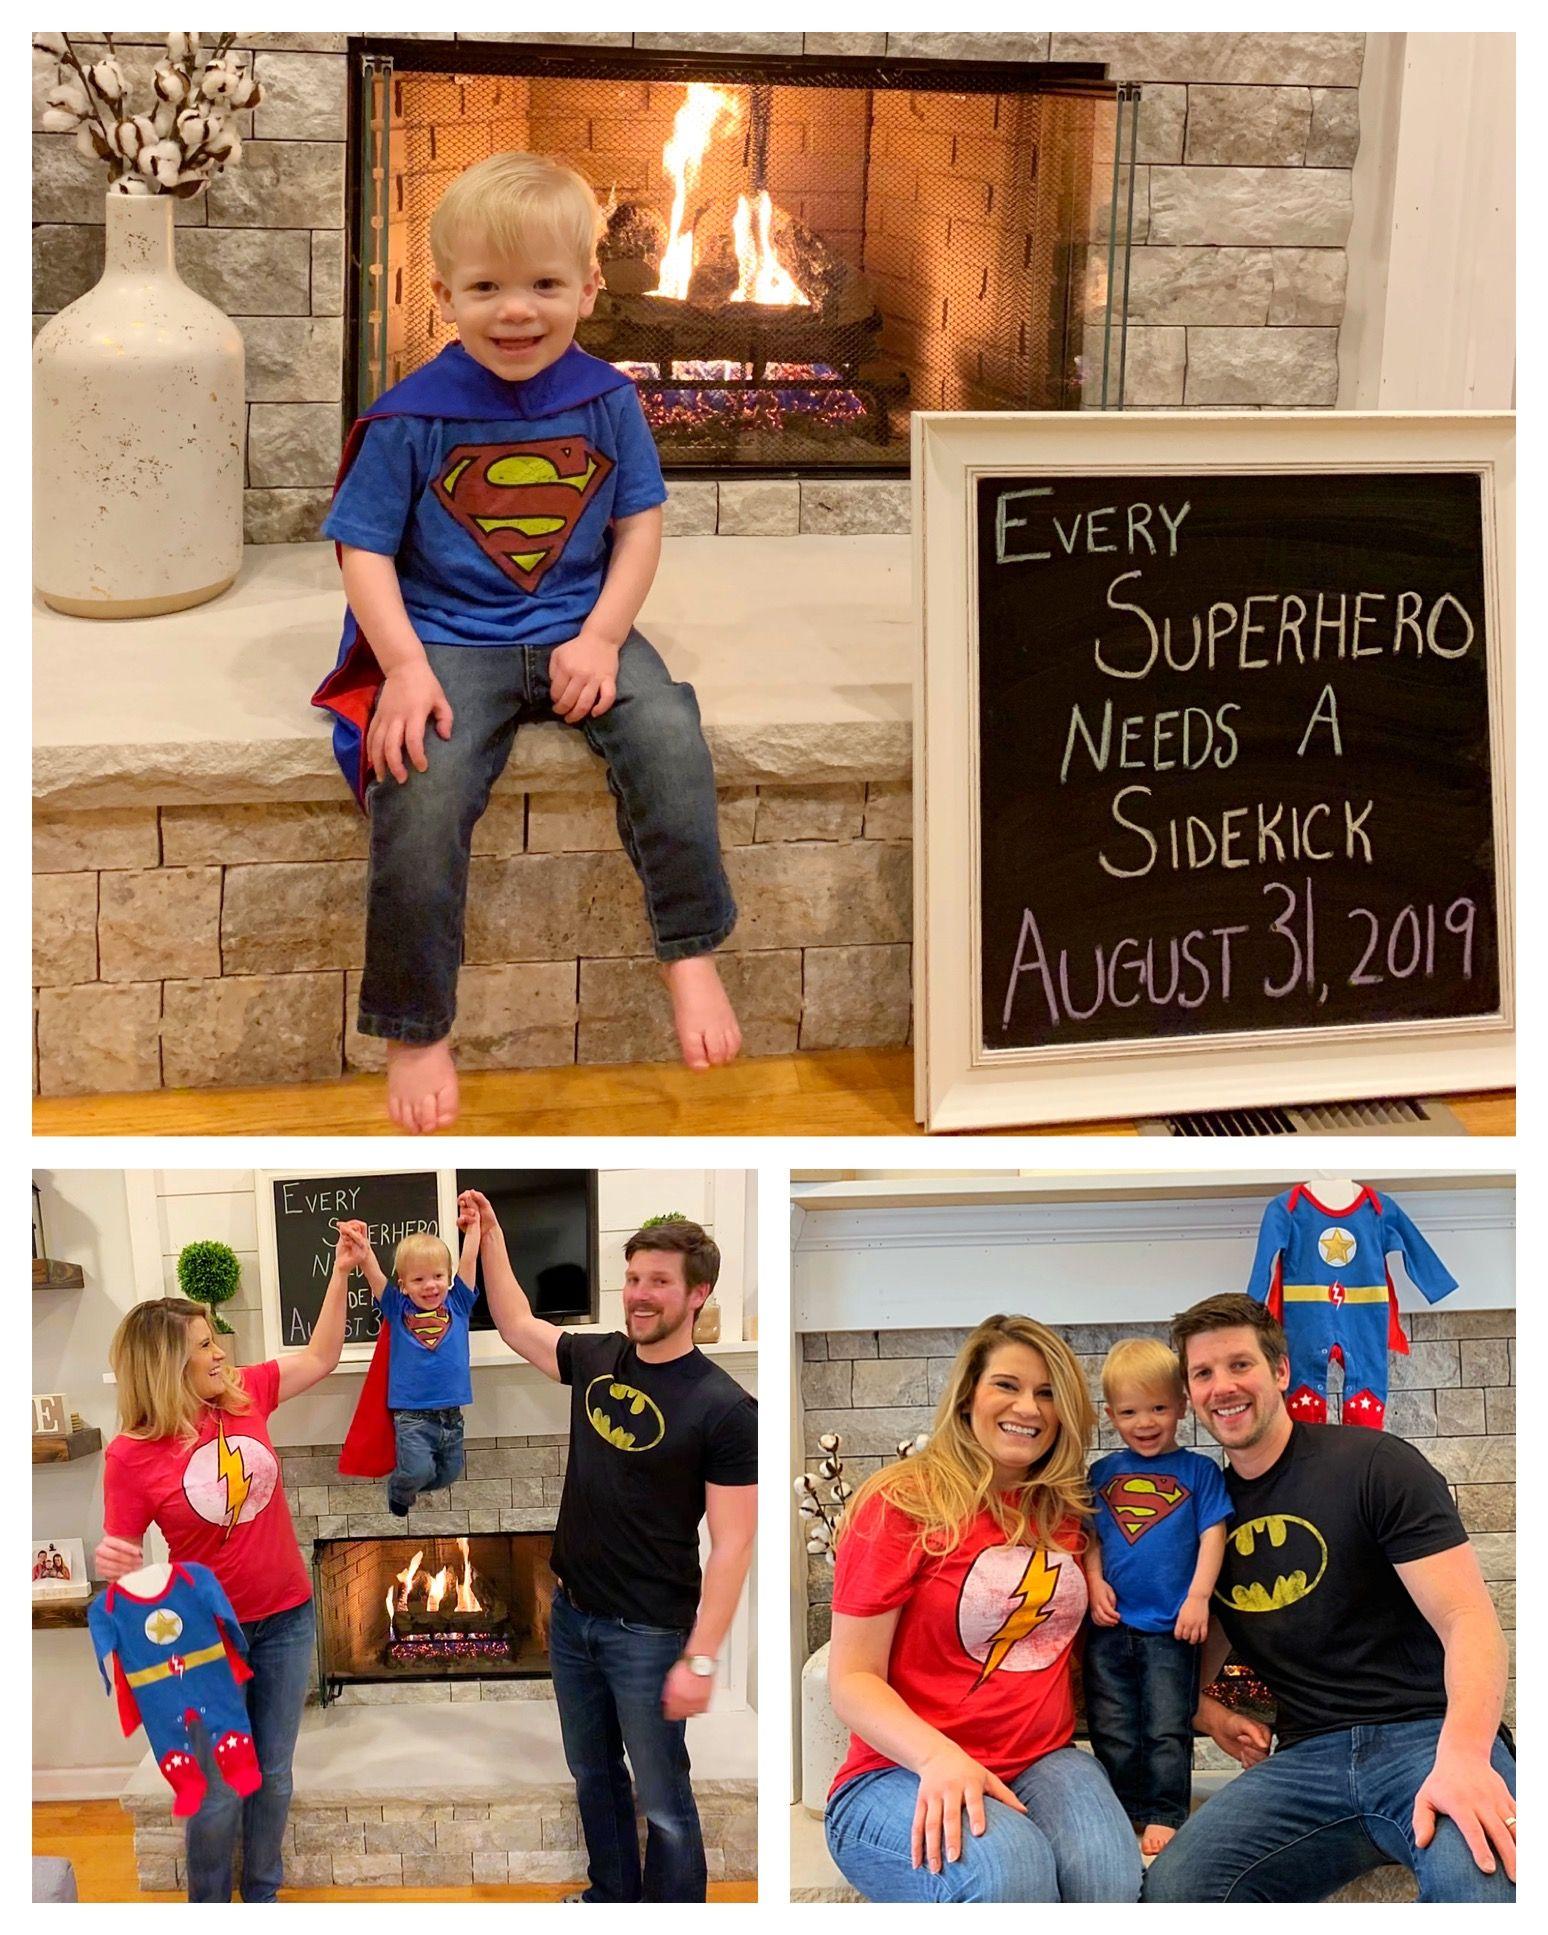 Every Superhero Need A Sidekick Big Brother Birth Announcement Superhero Birth Announcement Big Br Big Brother Announcement Birth Announcement Baby Shower Diy